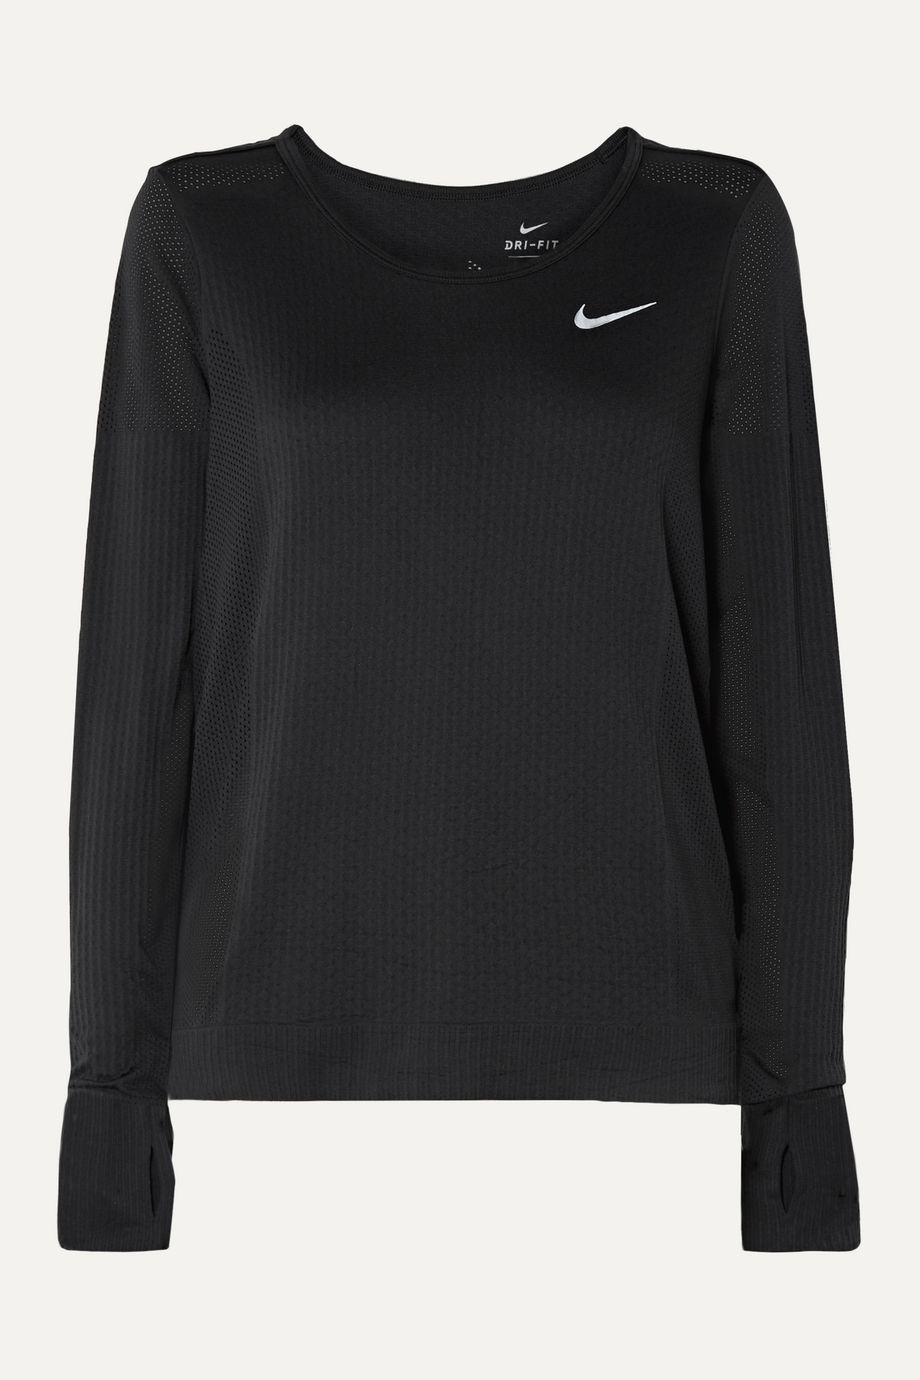 Nike Infinite mesh-paneled Dri-FIT stretch-jacquard top